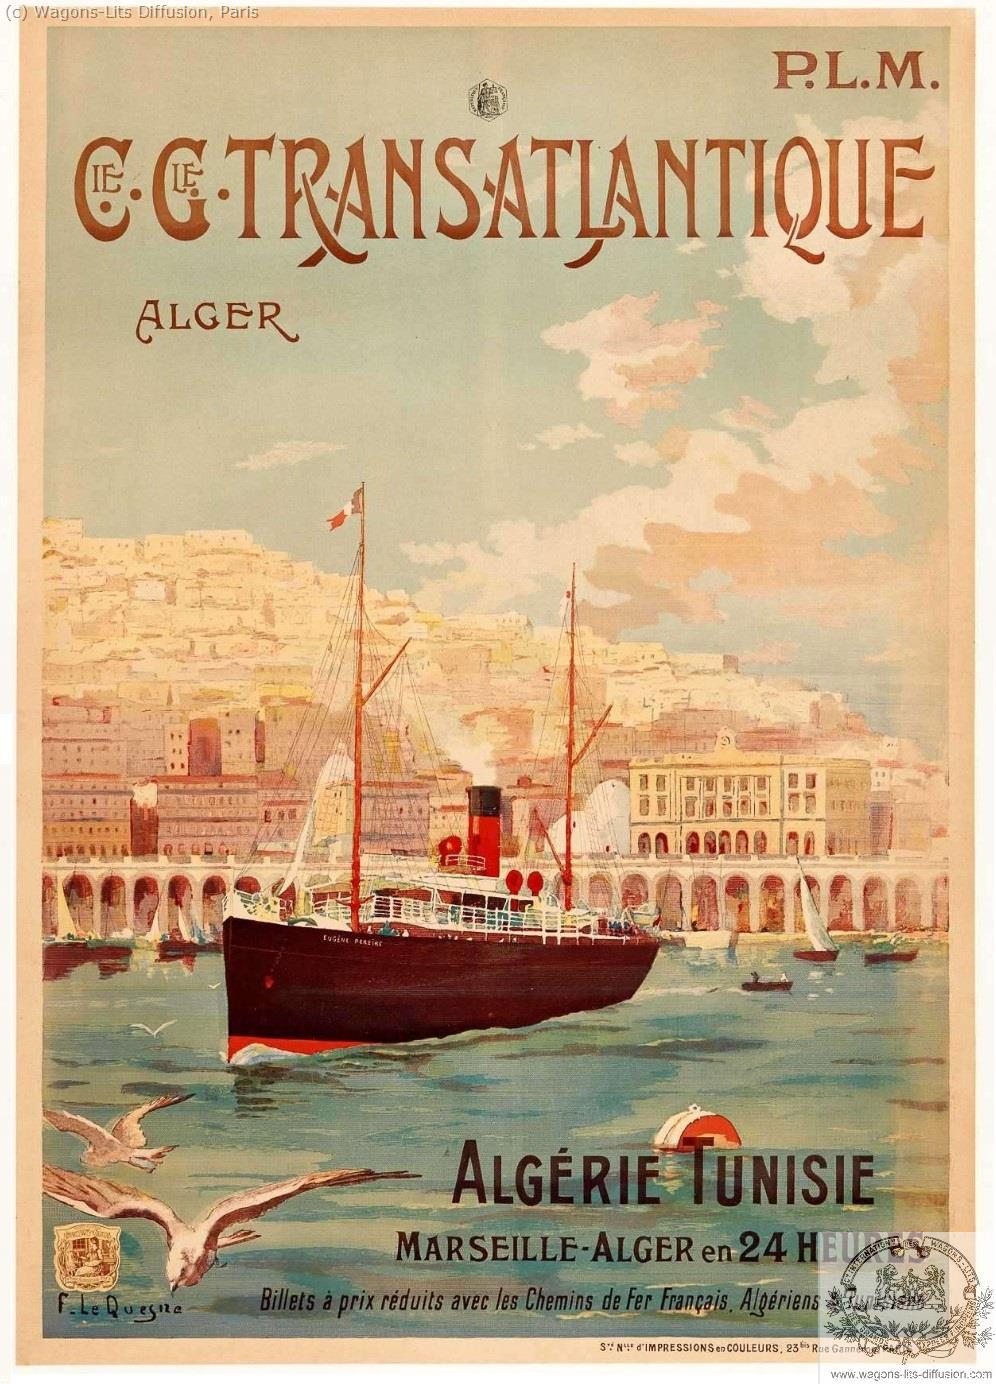 PLM CGT Algerie Tunisie 2 Ref 997